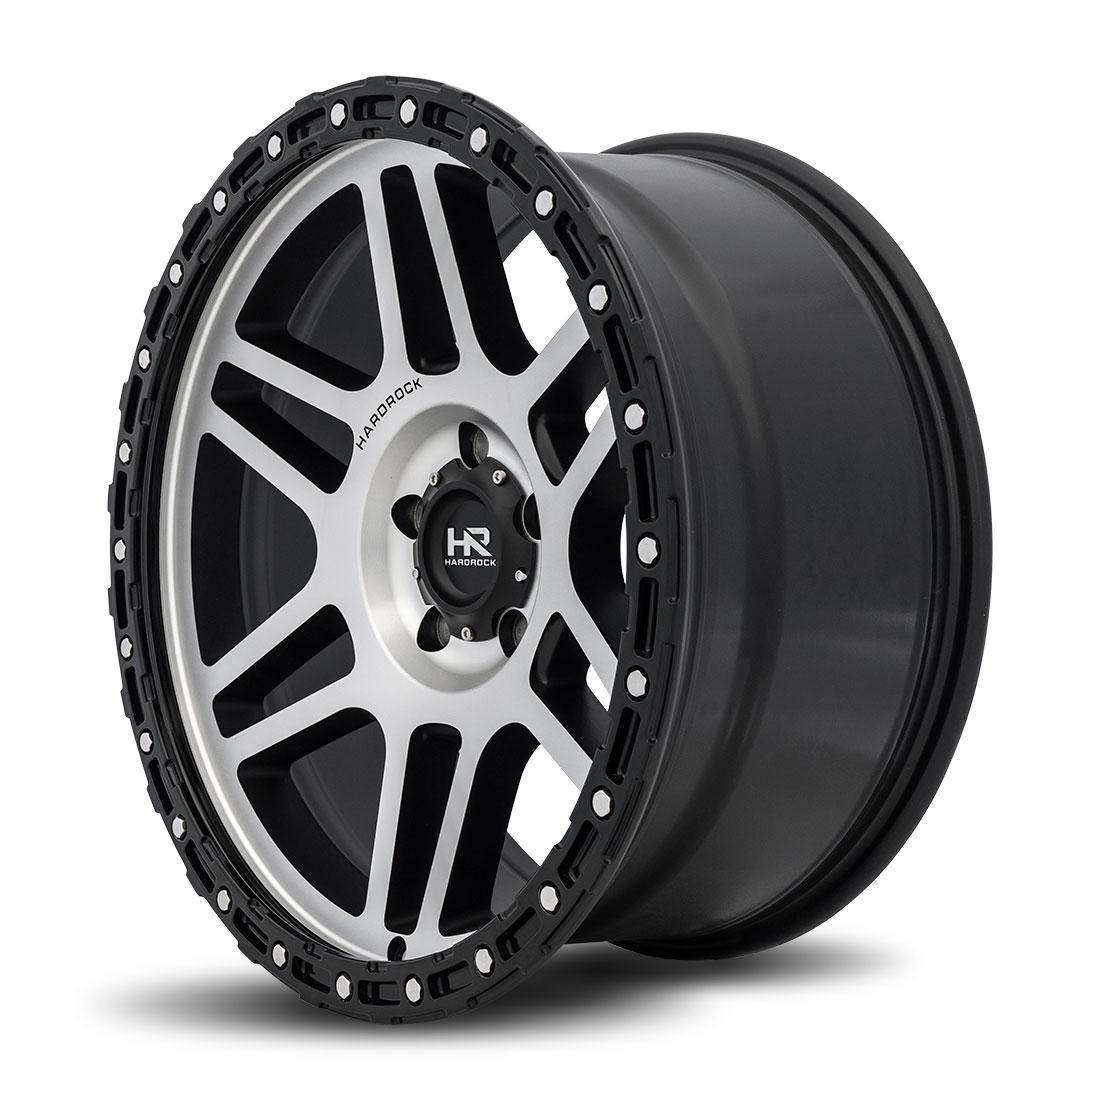 Hardrock Offroad Wheels H103 - Black Machine Face - 20x9